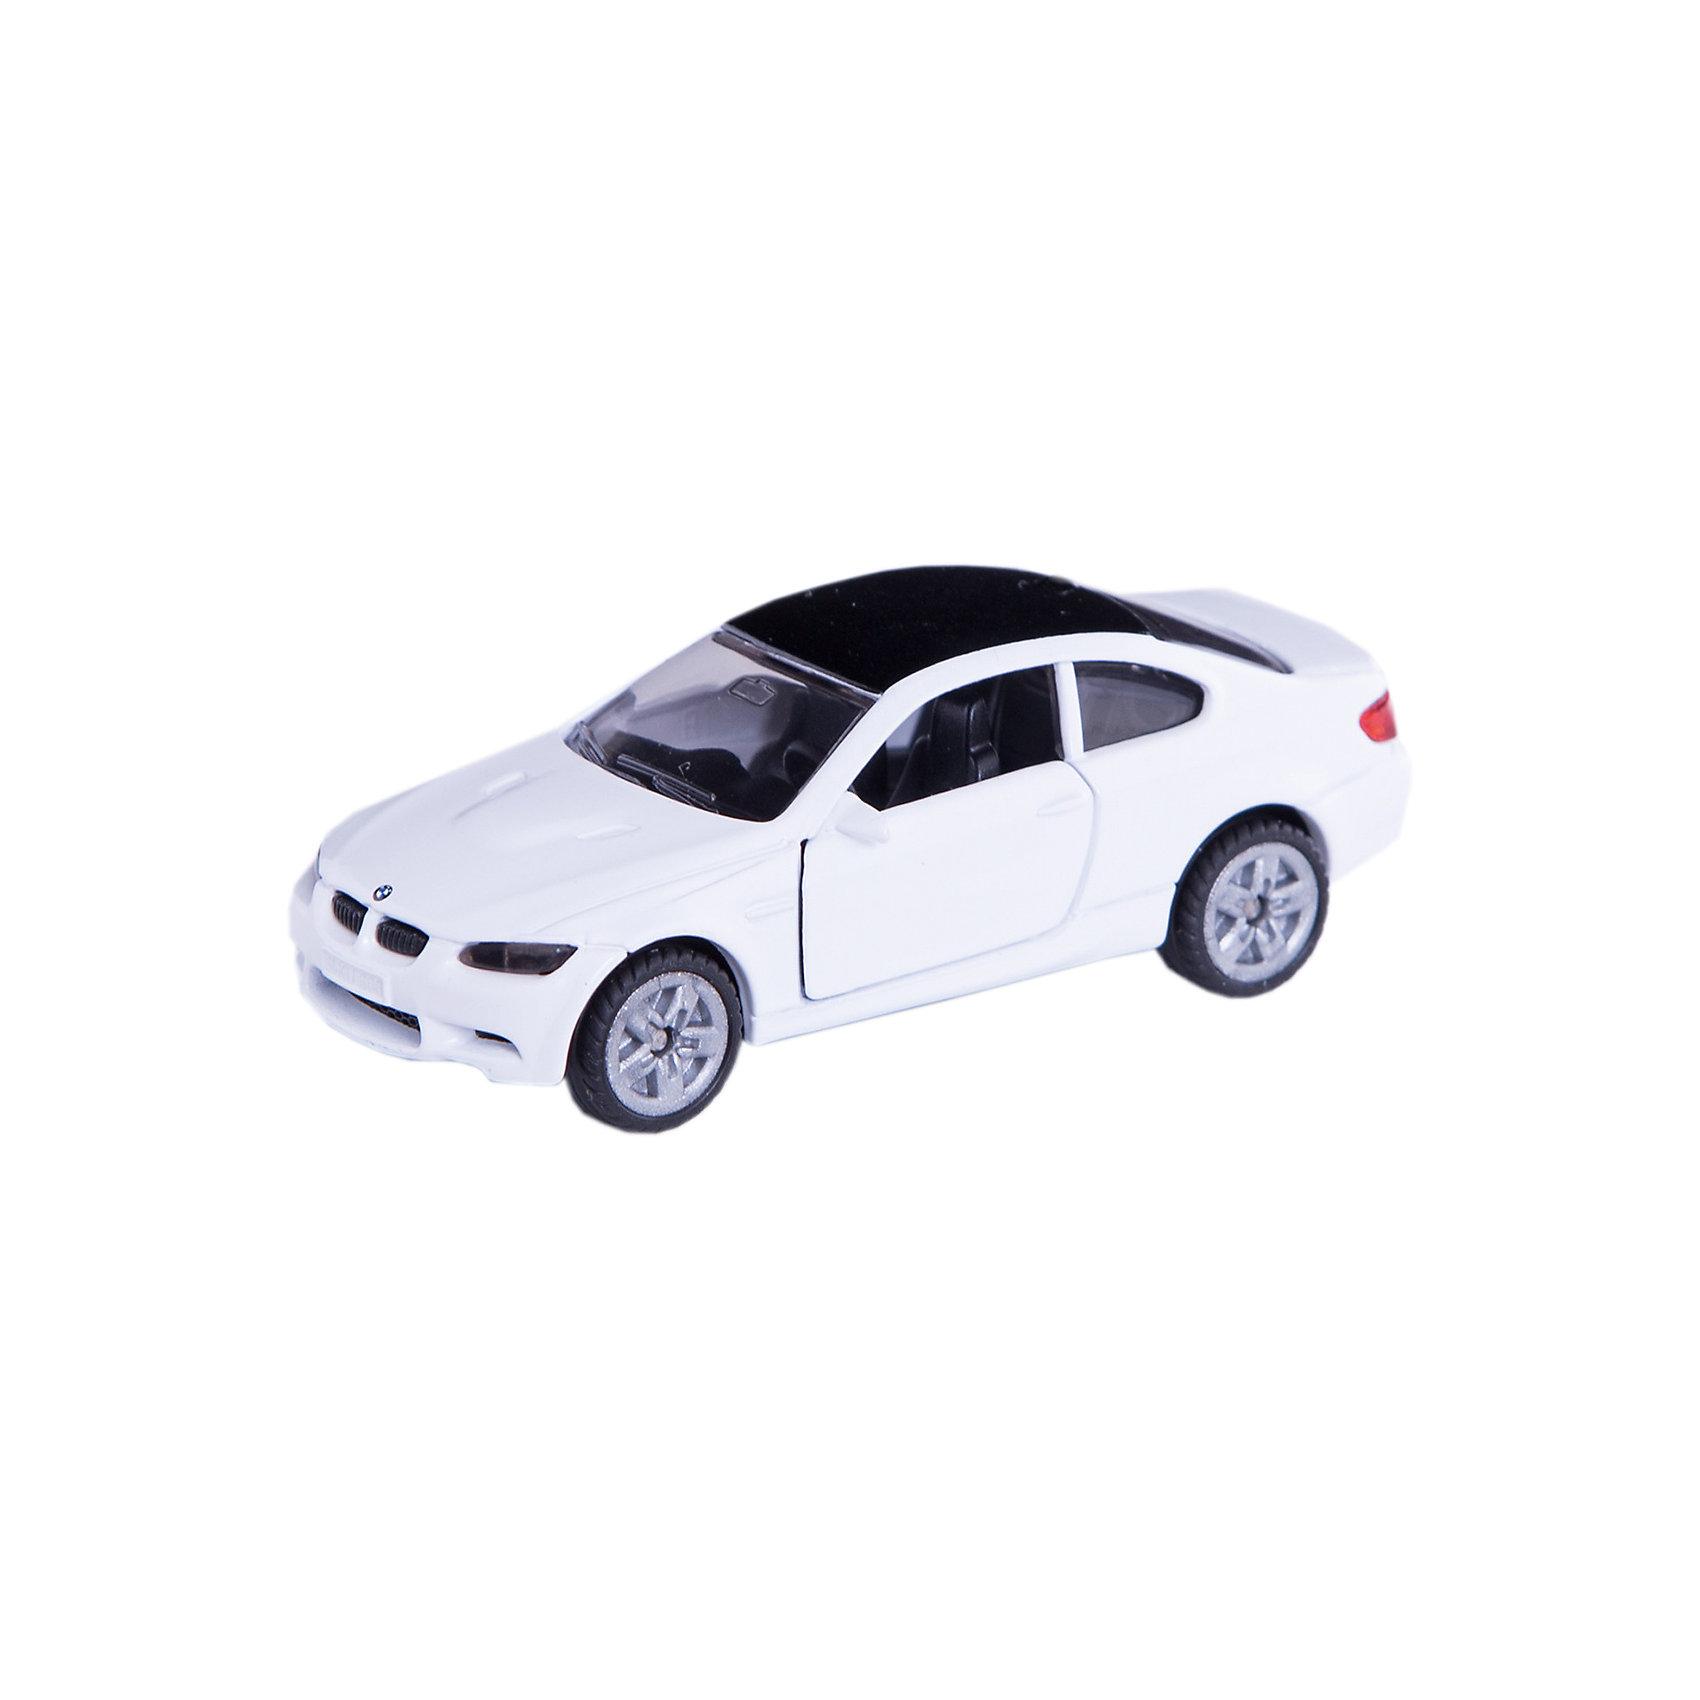 SIKU SIKU 1450 Машина BMW M3 купе игрушка siku ауди r8 8 0 3 7 2 4см 1430